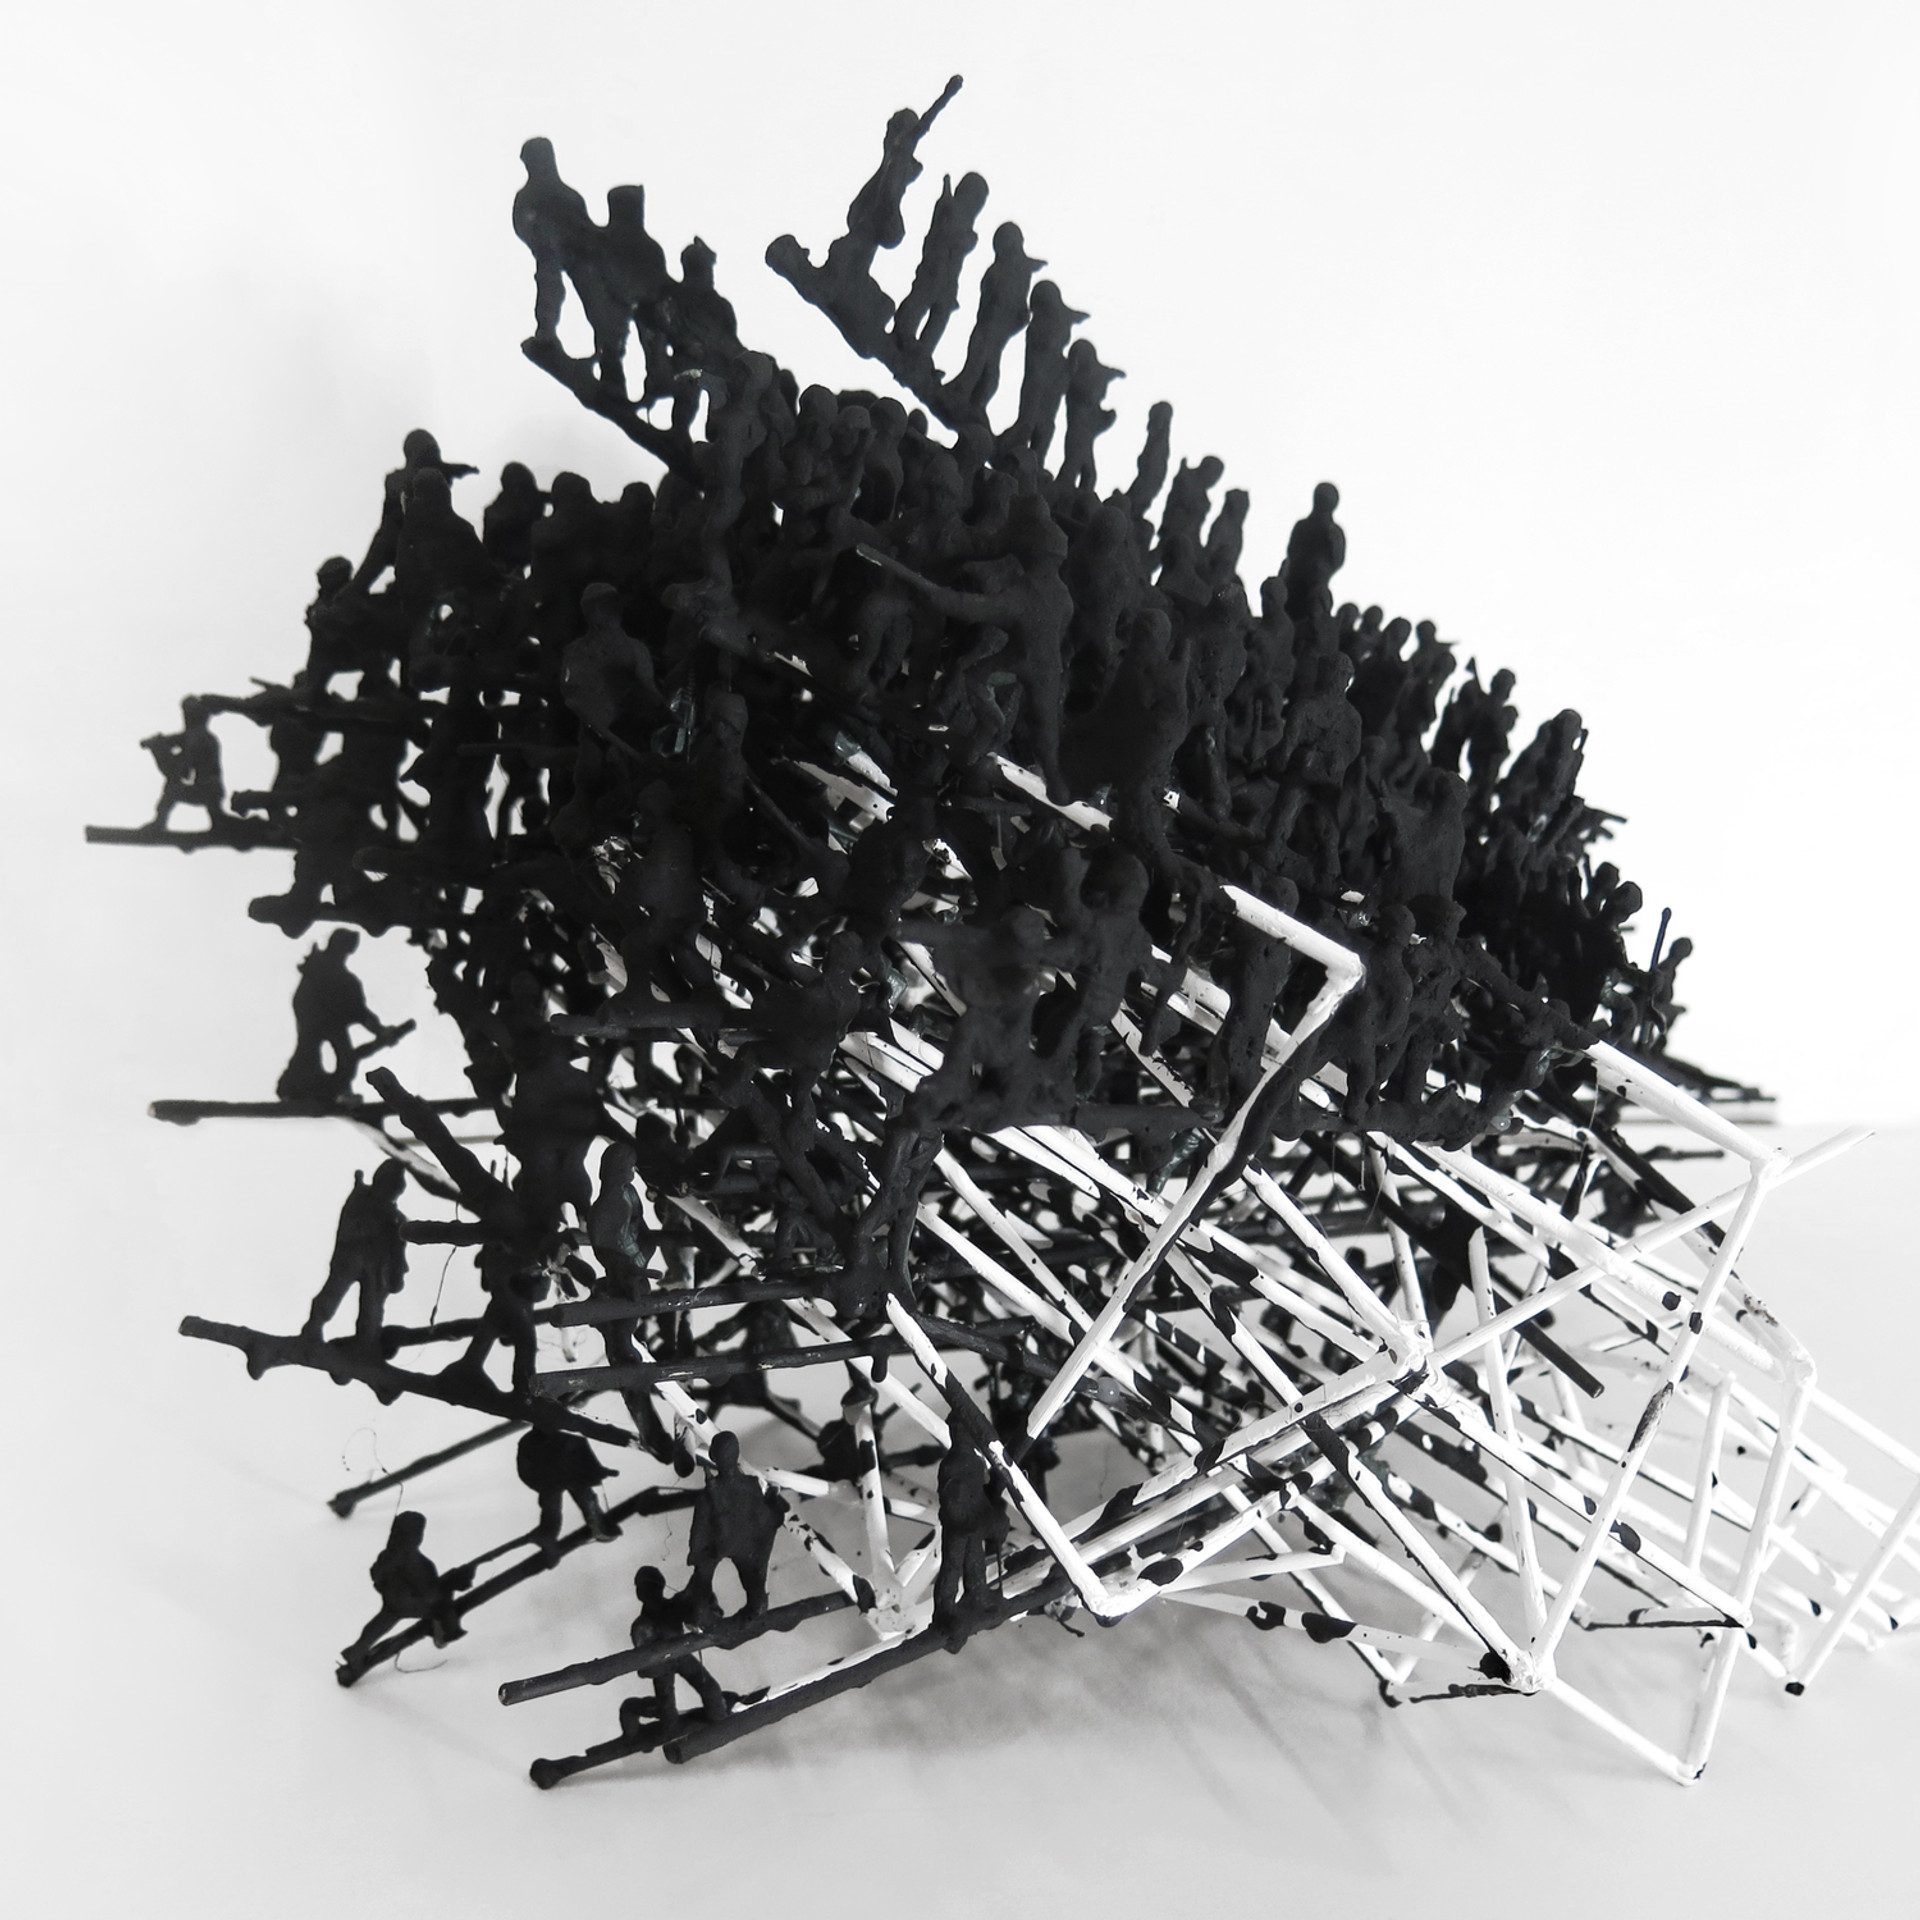 Imprints, 2016. Straw, plastic figurines, plaster and acrylic. 30 x 30 x 60 cm. Editions 1-3